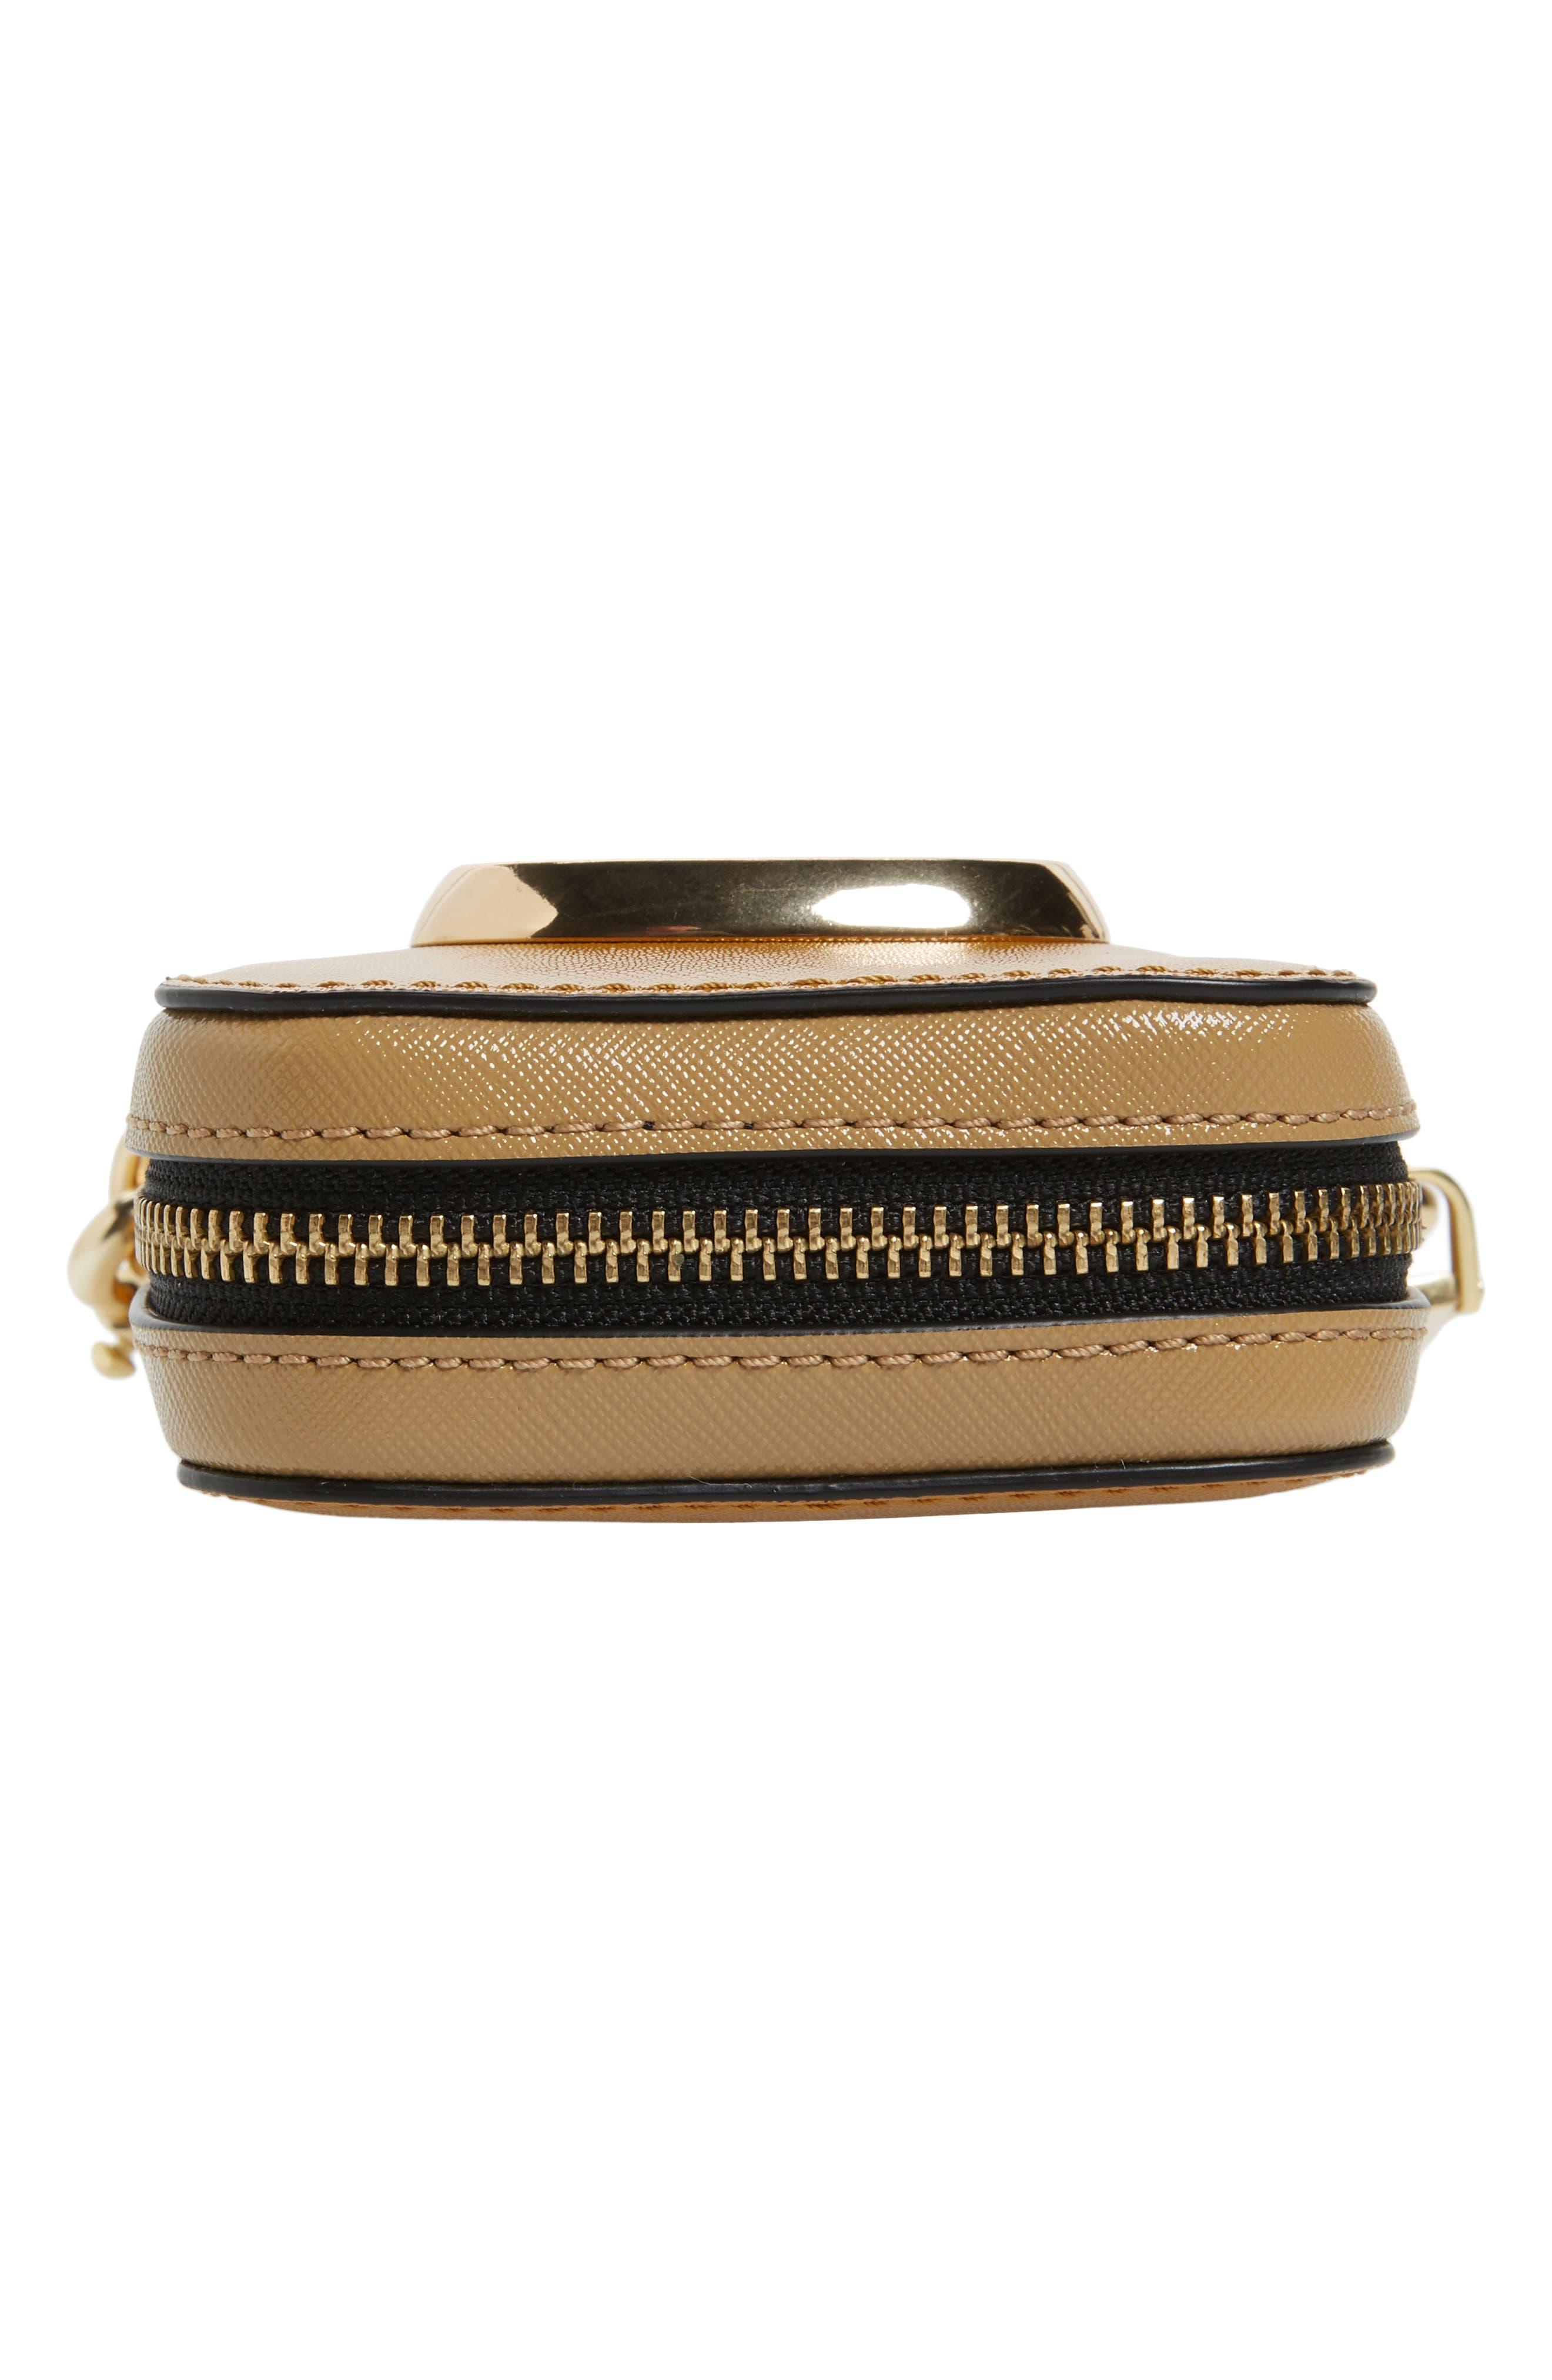 Hot Shot Saffiano Leather Shoulder Bag,                             Alternate thumbnail 23, color,